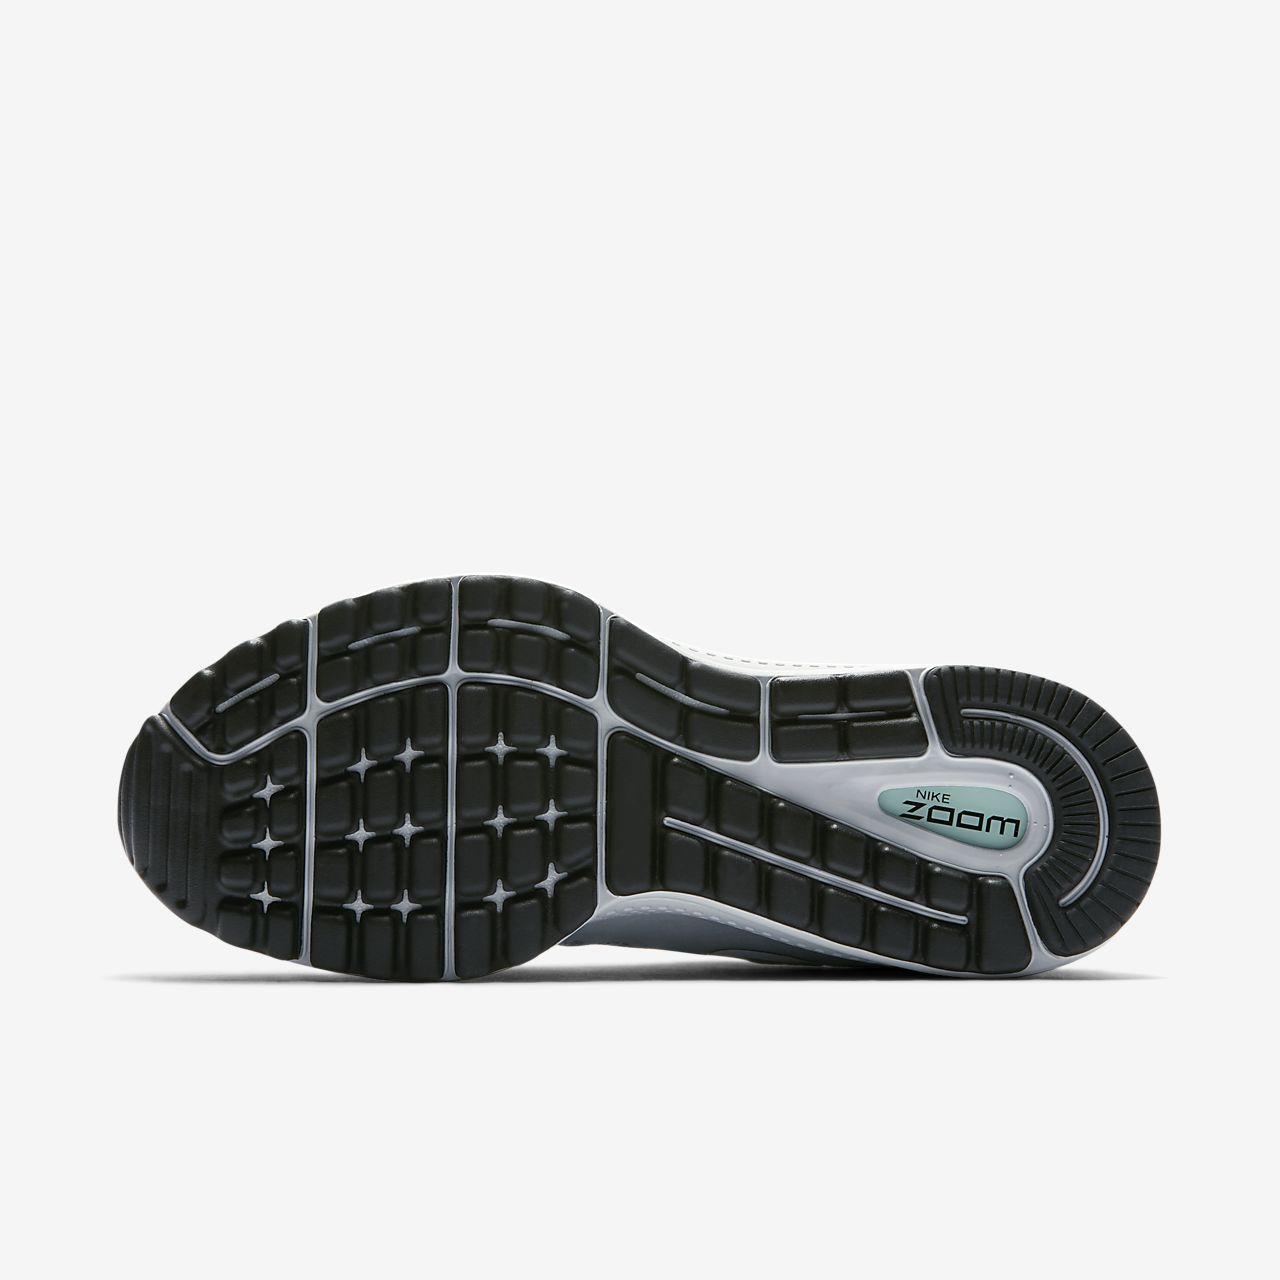 a3c9ed8b9f7c Nike Air Zoom Vomero 13 Women s Running Shoe. Nike.com GB